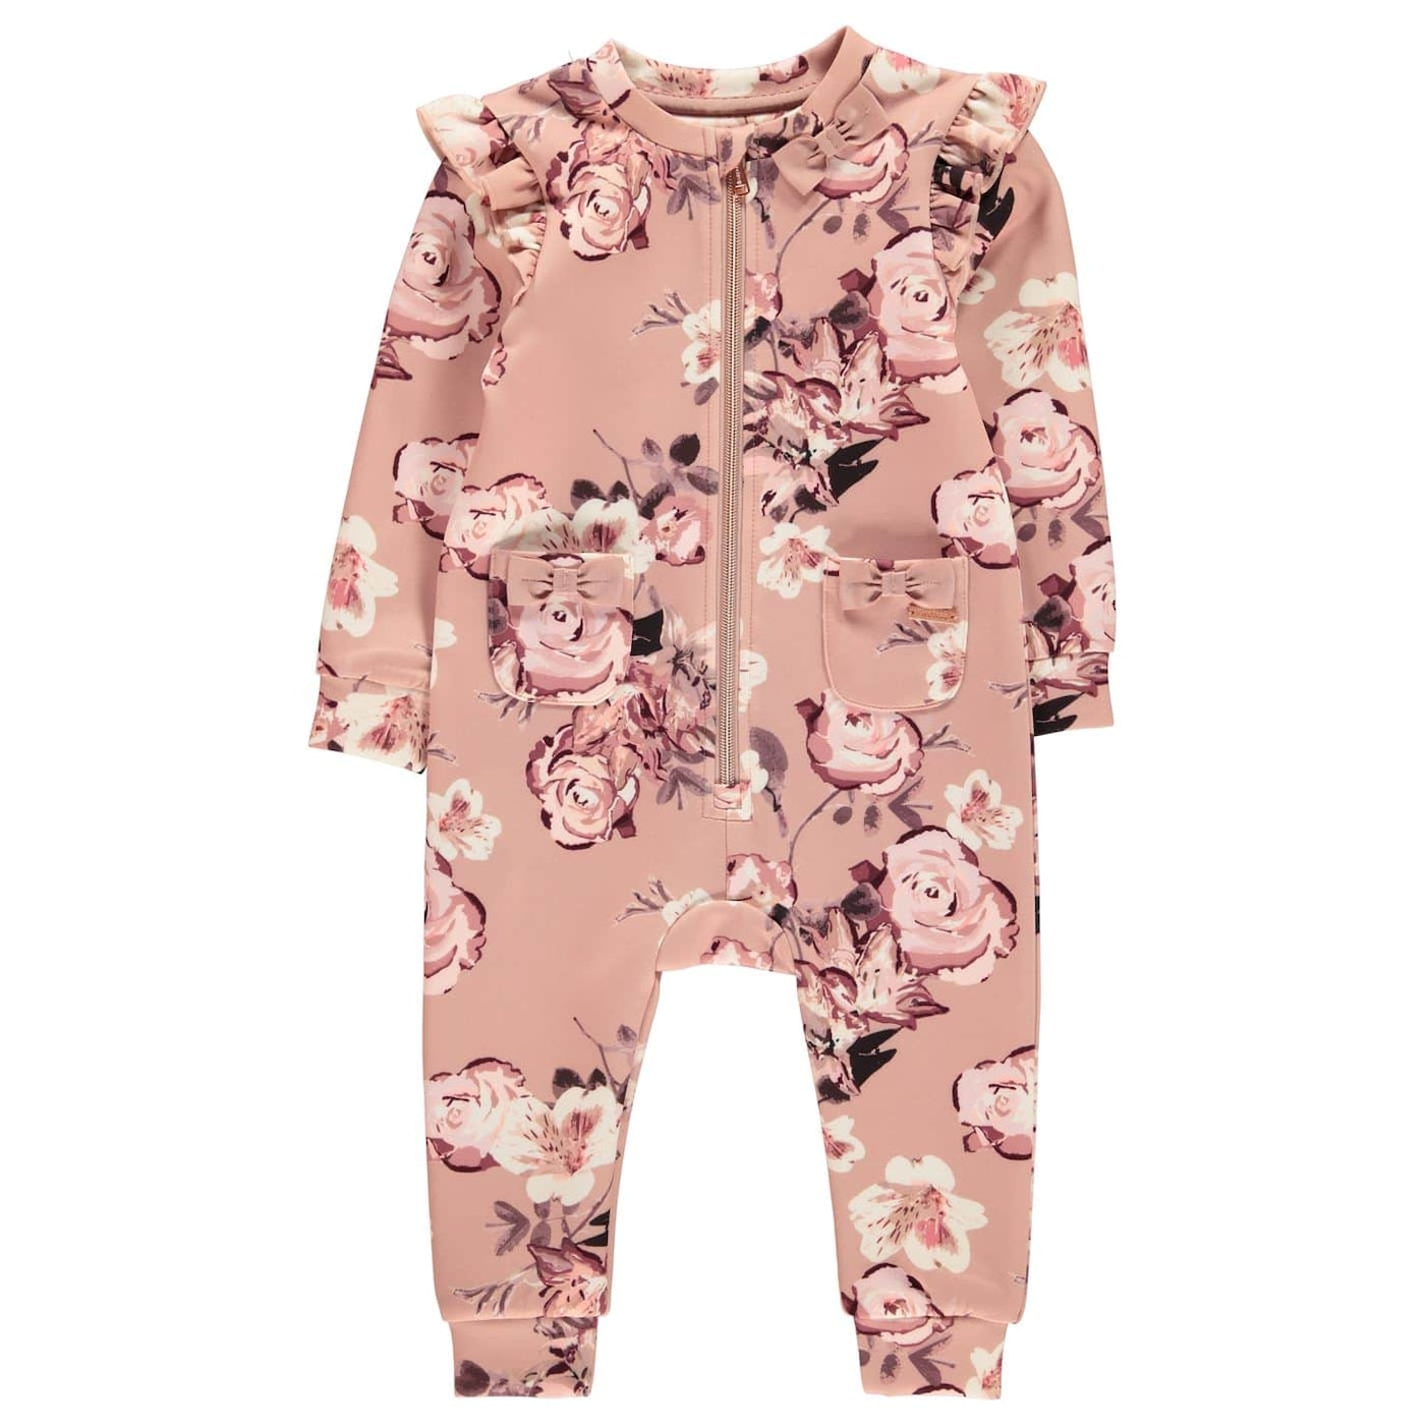 Firetrap Romper Suit Baby Girls